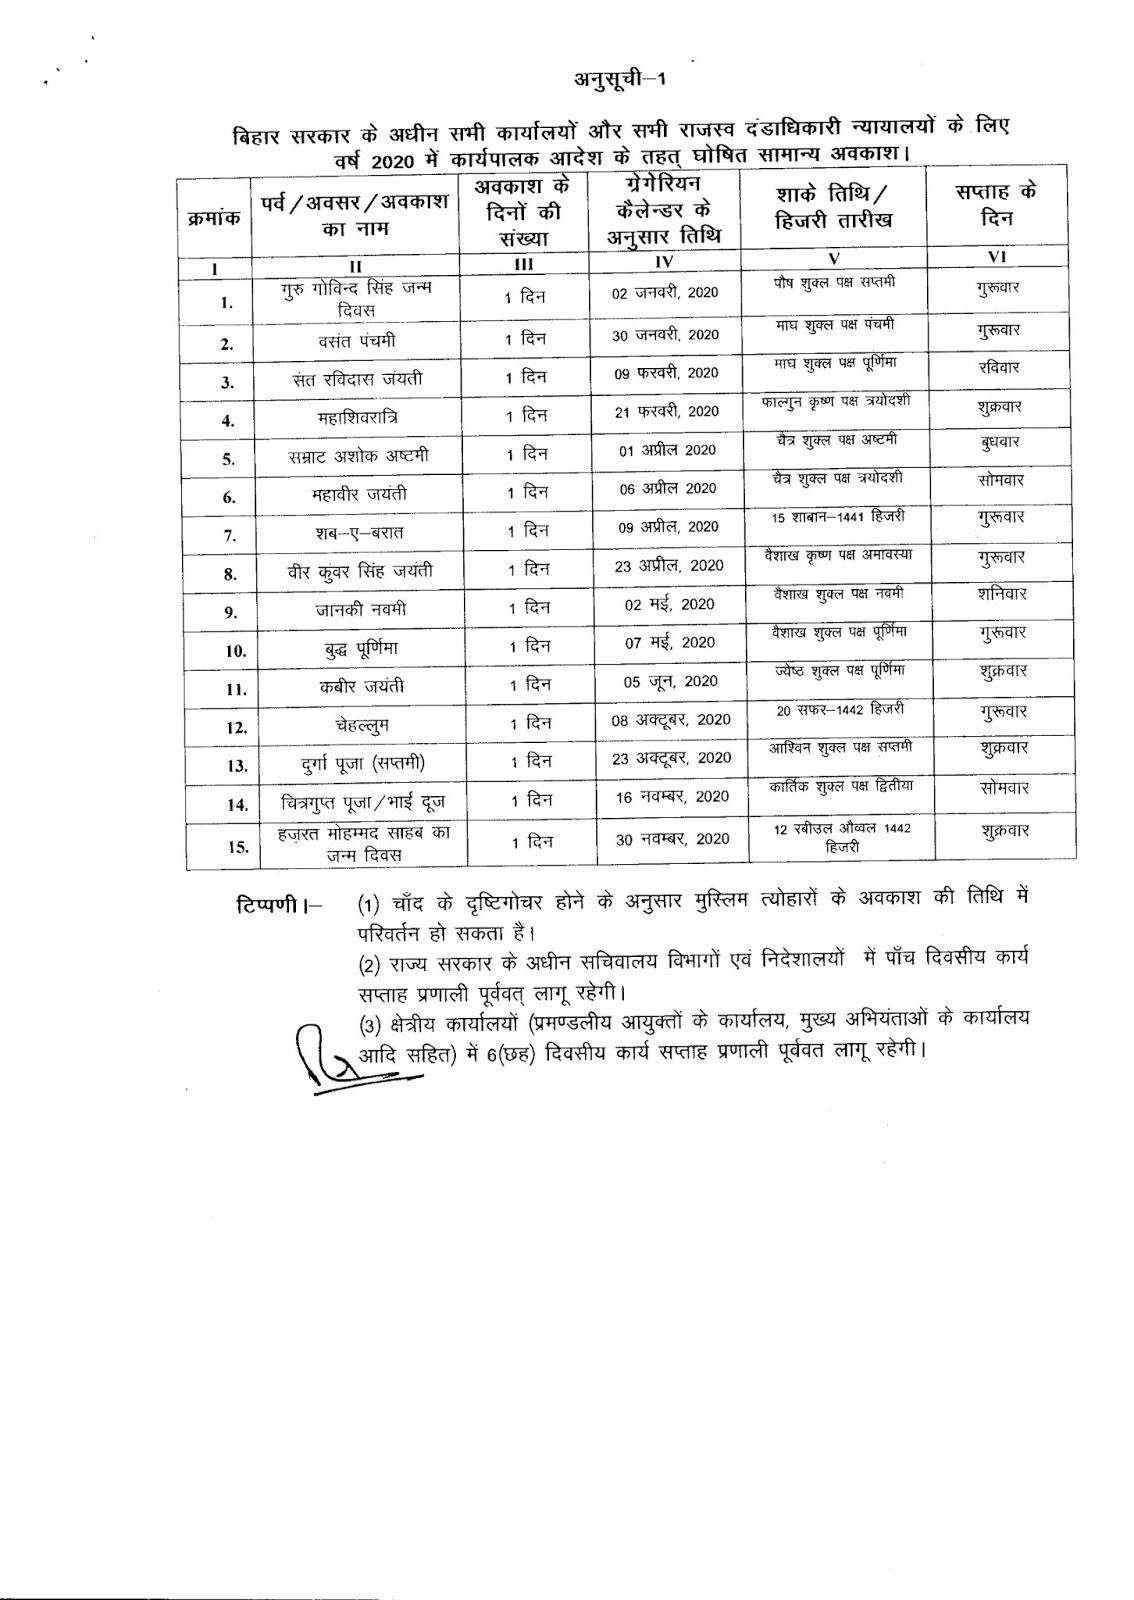 Bihar Government Calendar 2020 #educratsweb throughout Bihar Govt Official Calendar 2020